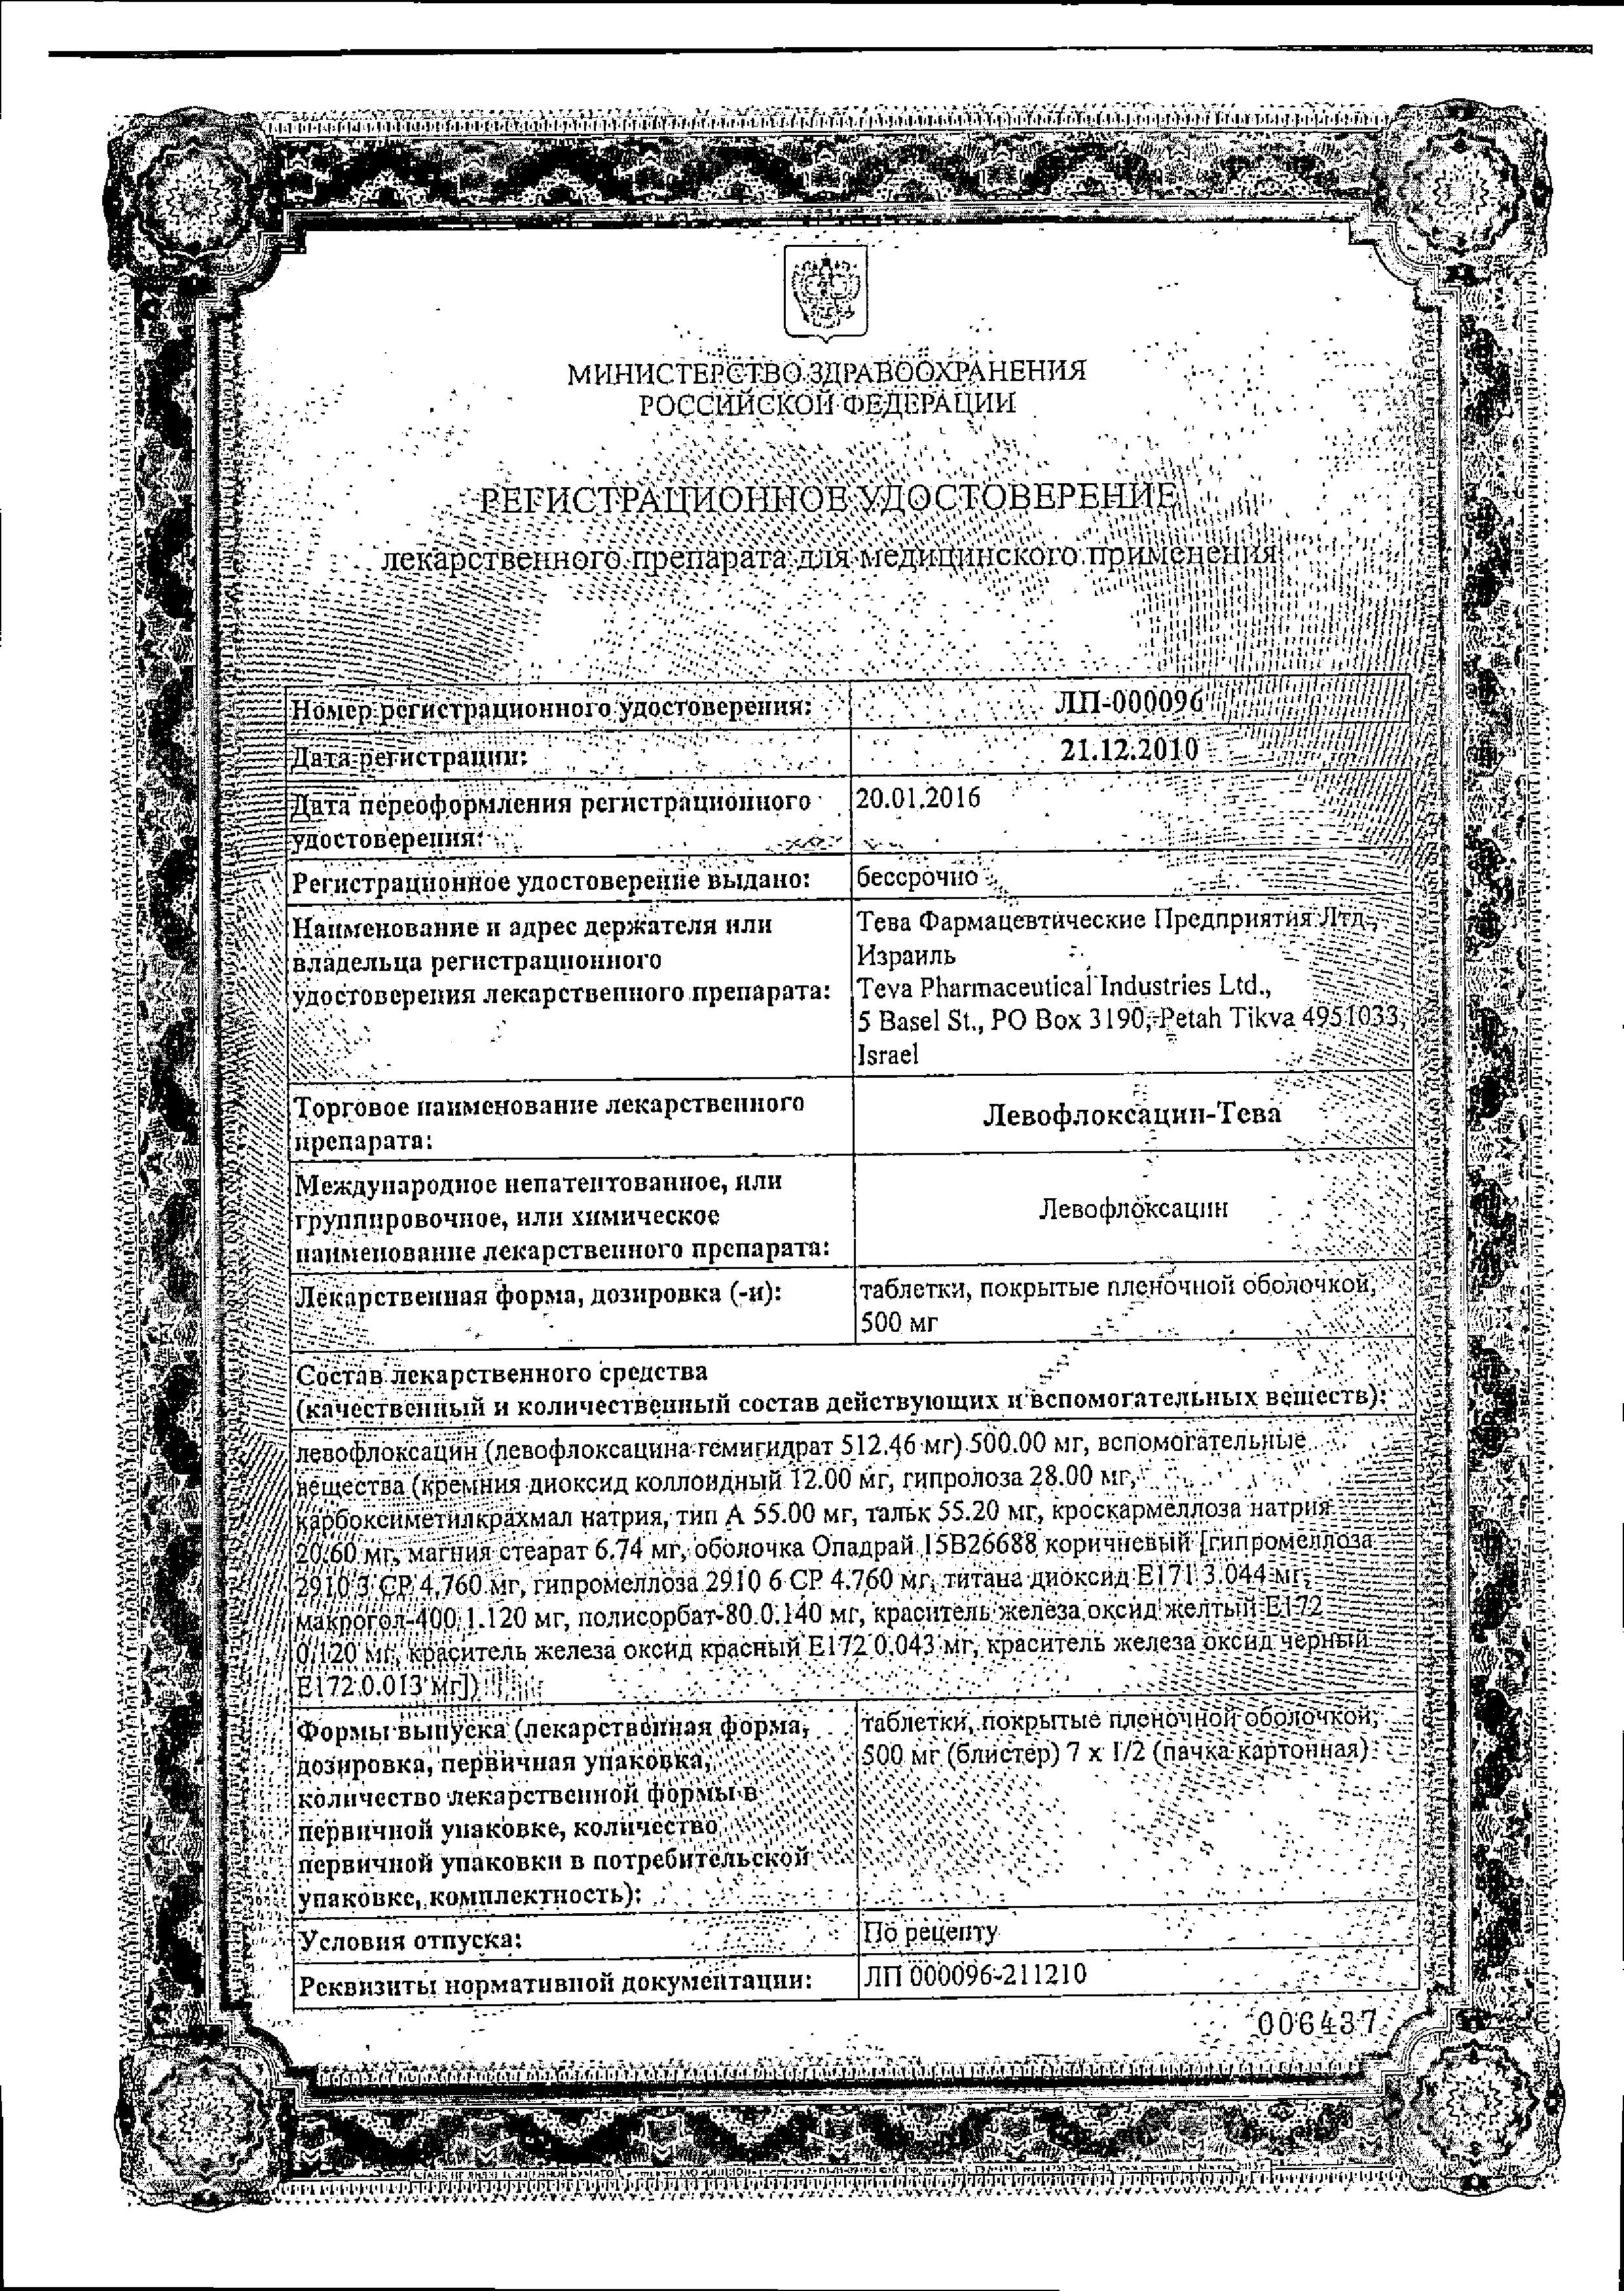 Левофлоксацин-Тева сертификат